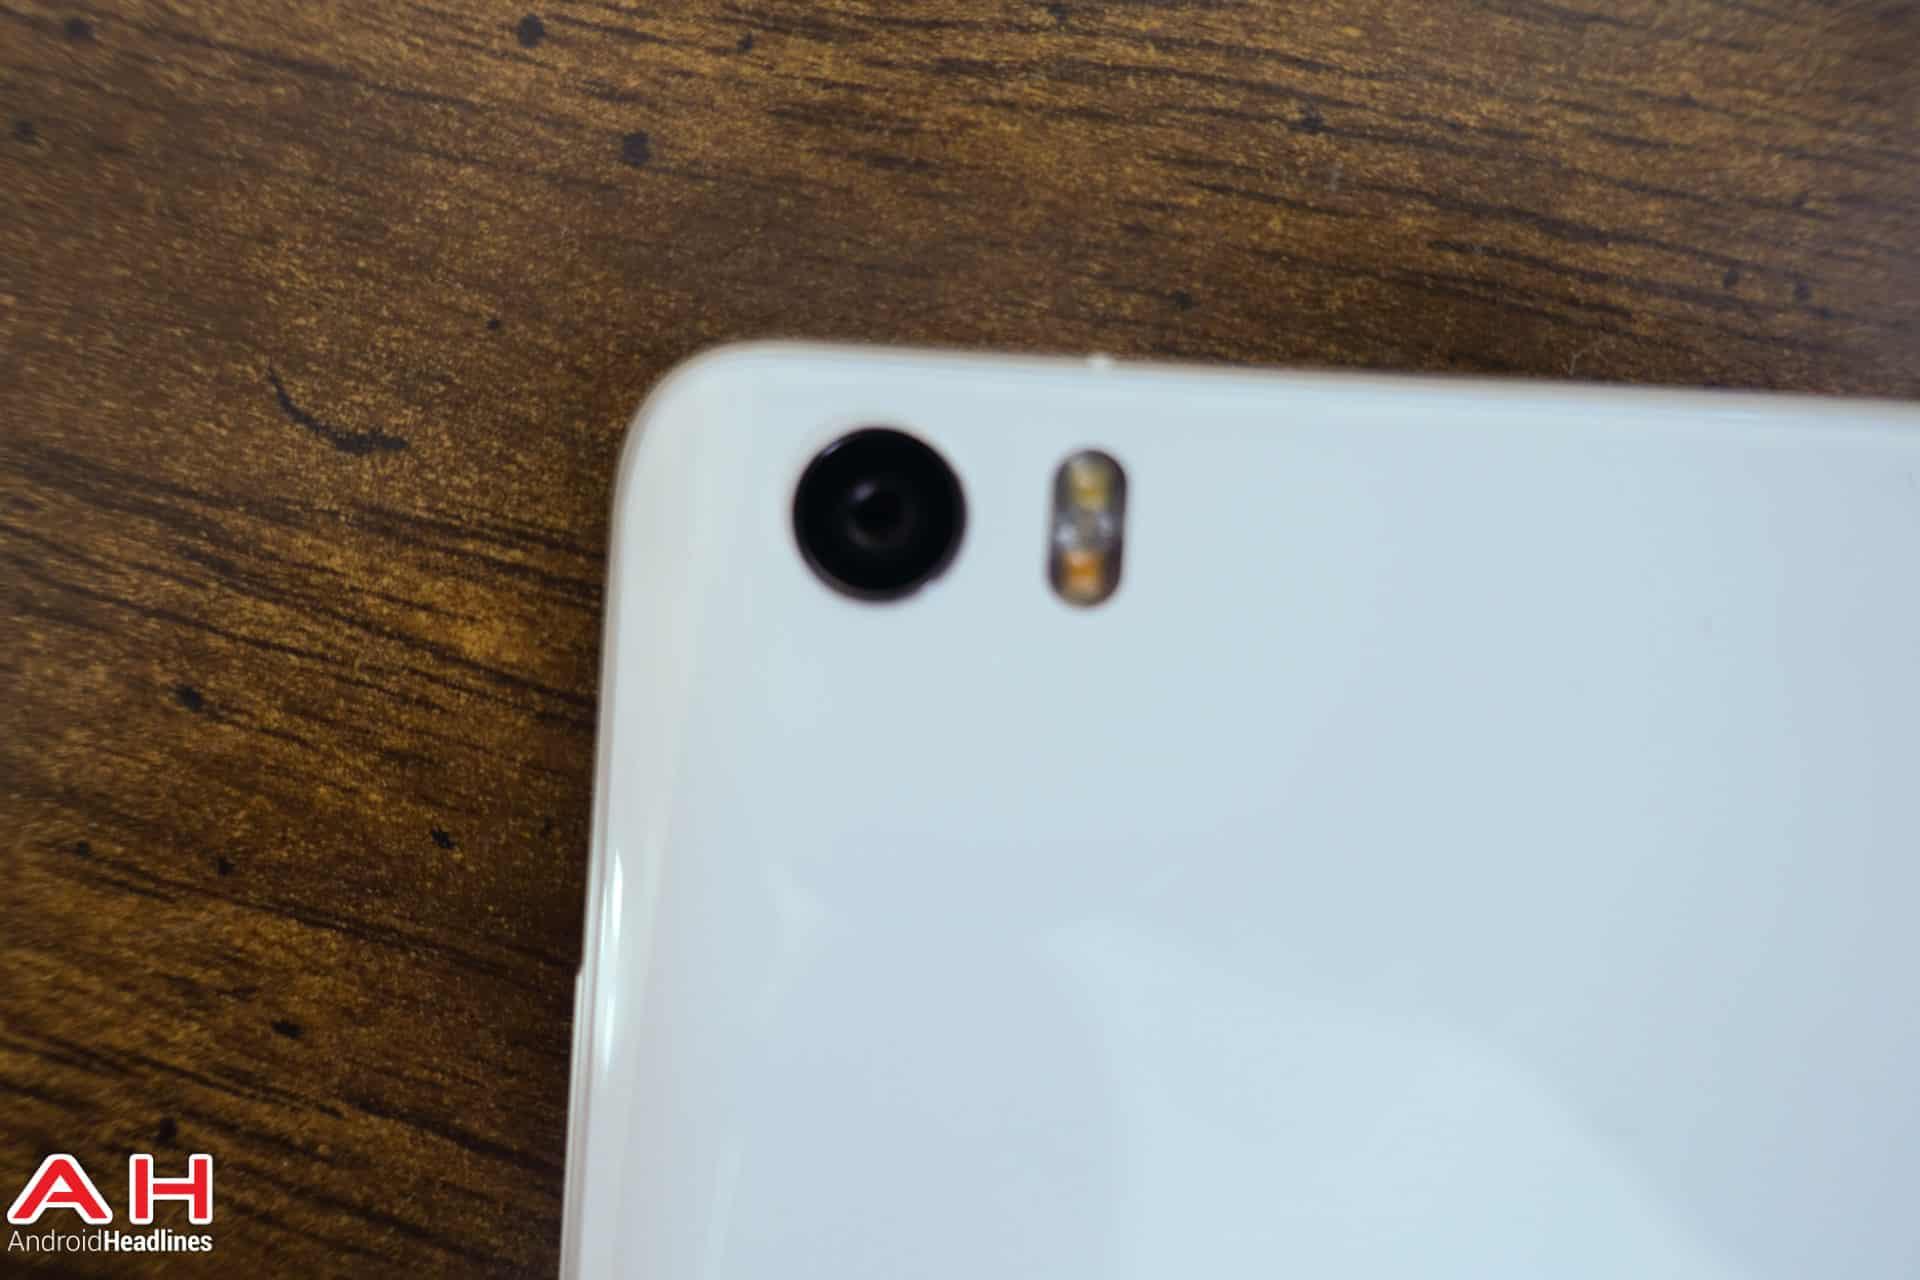 Xiaomi Mi Note AH 03775